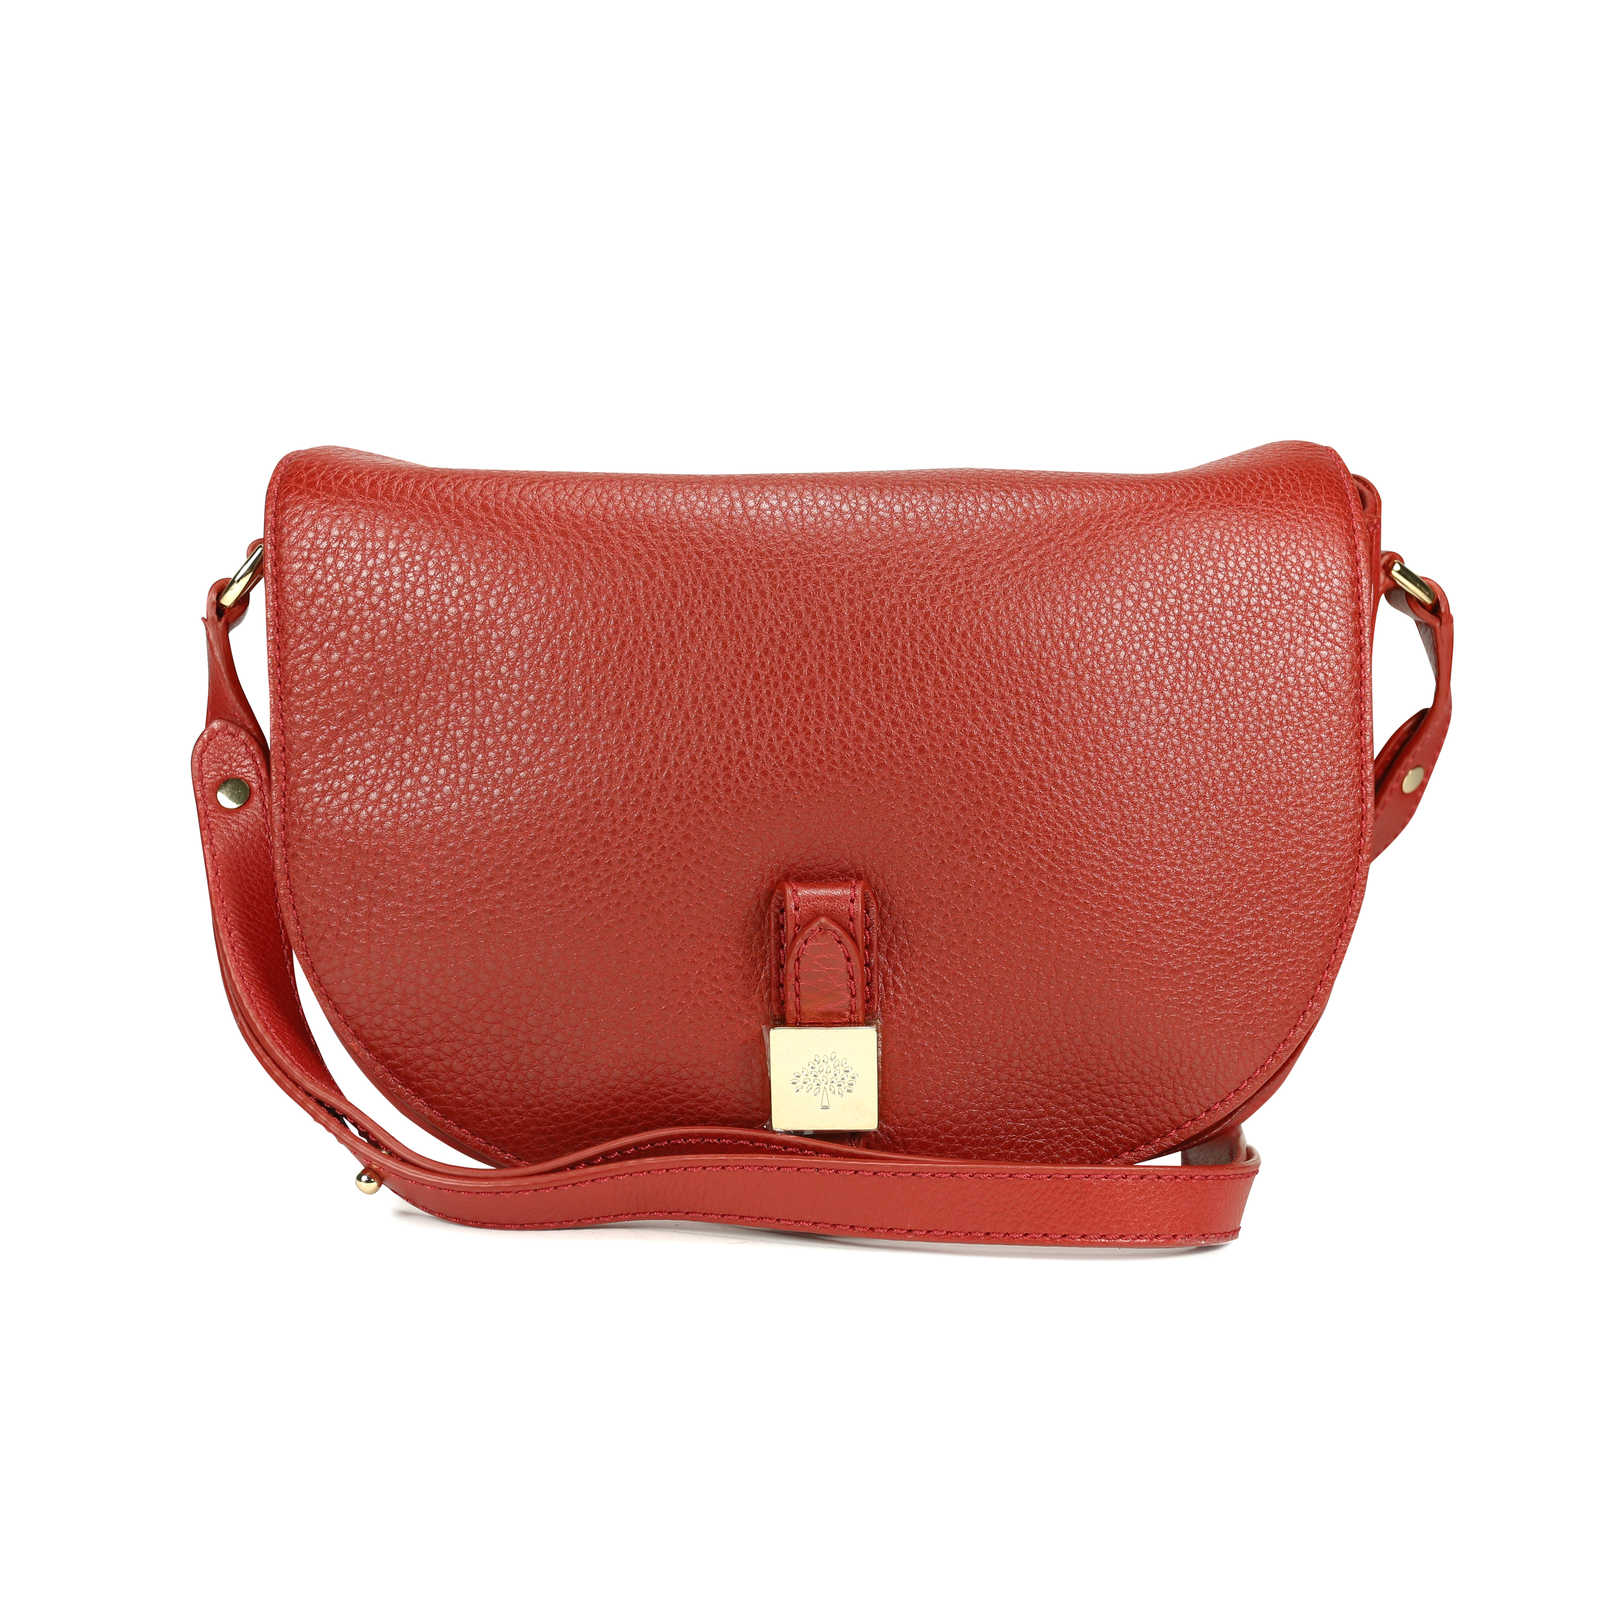 73adc23020 spain mulberry tessie leather satchel bag walmart c216a efe3f